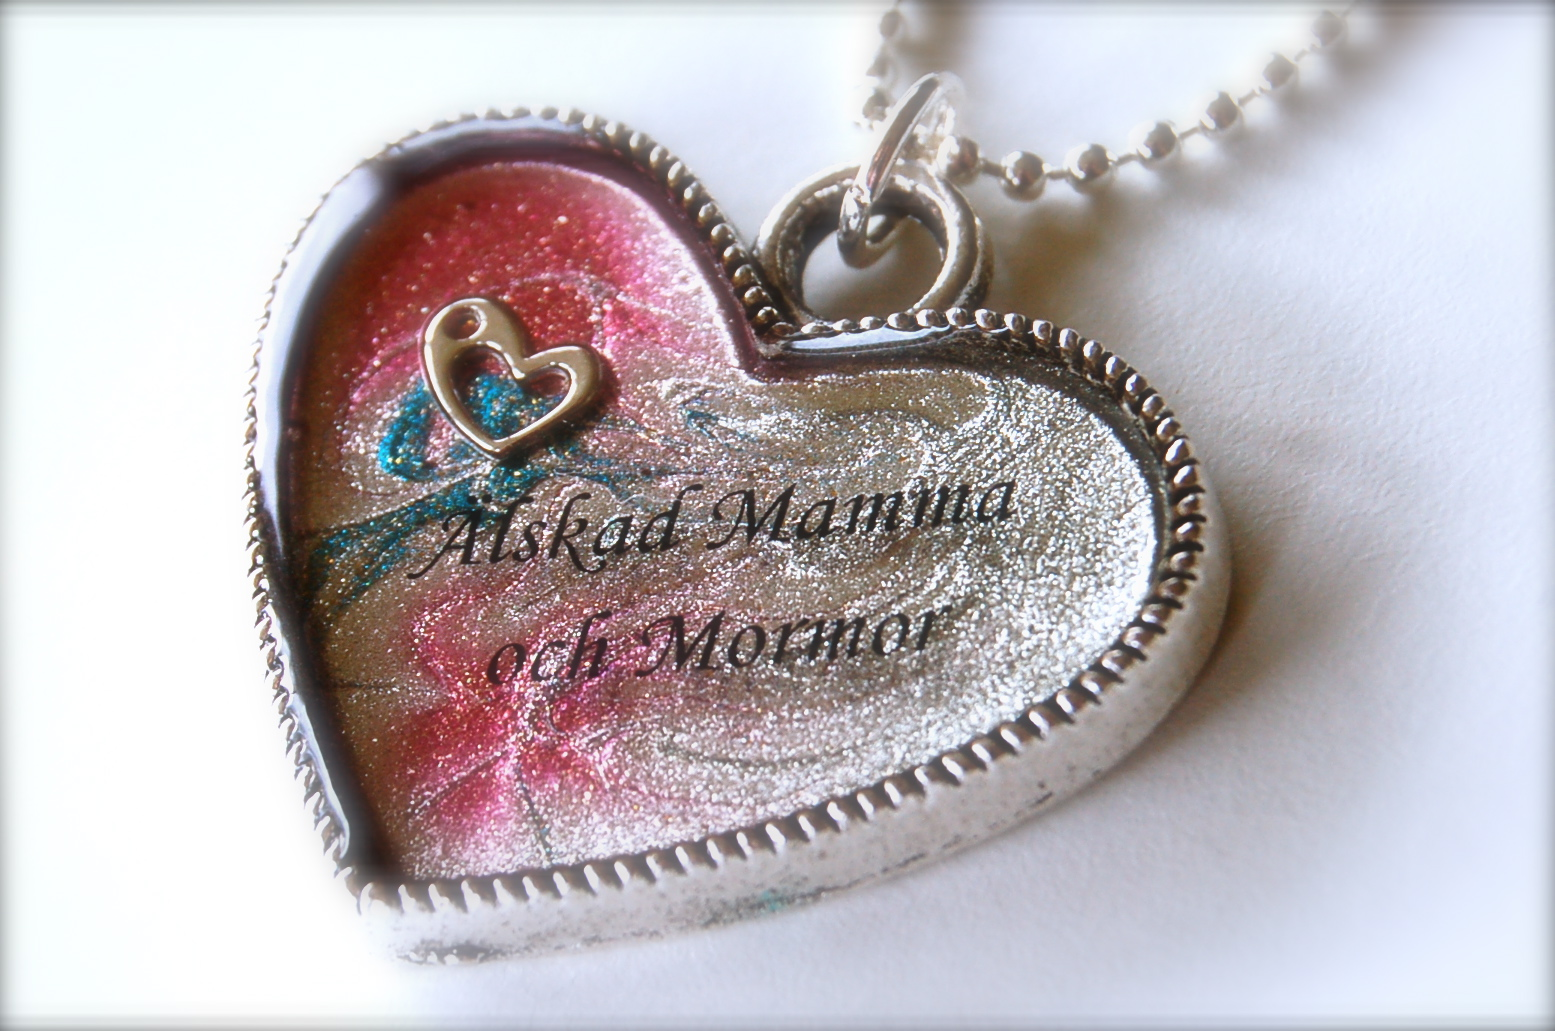 Nail polish jewelry, jewellery, nail polish necklace, bild, bilder nagellackssmycke, smycke nagellack, blogg nagellack